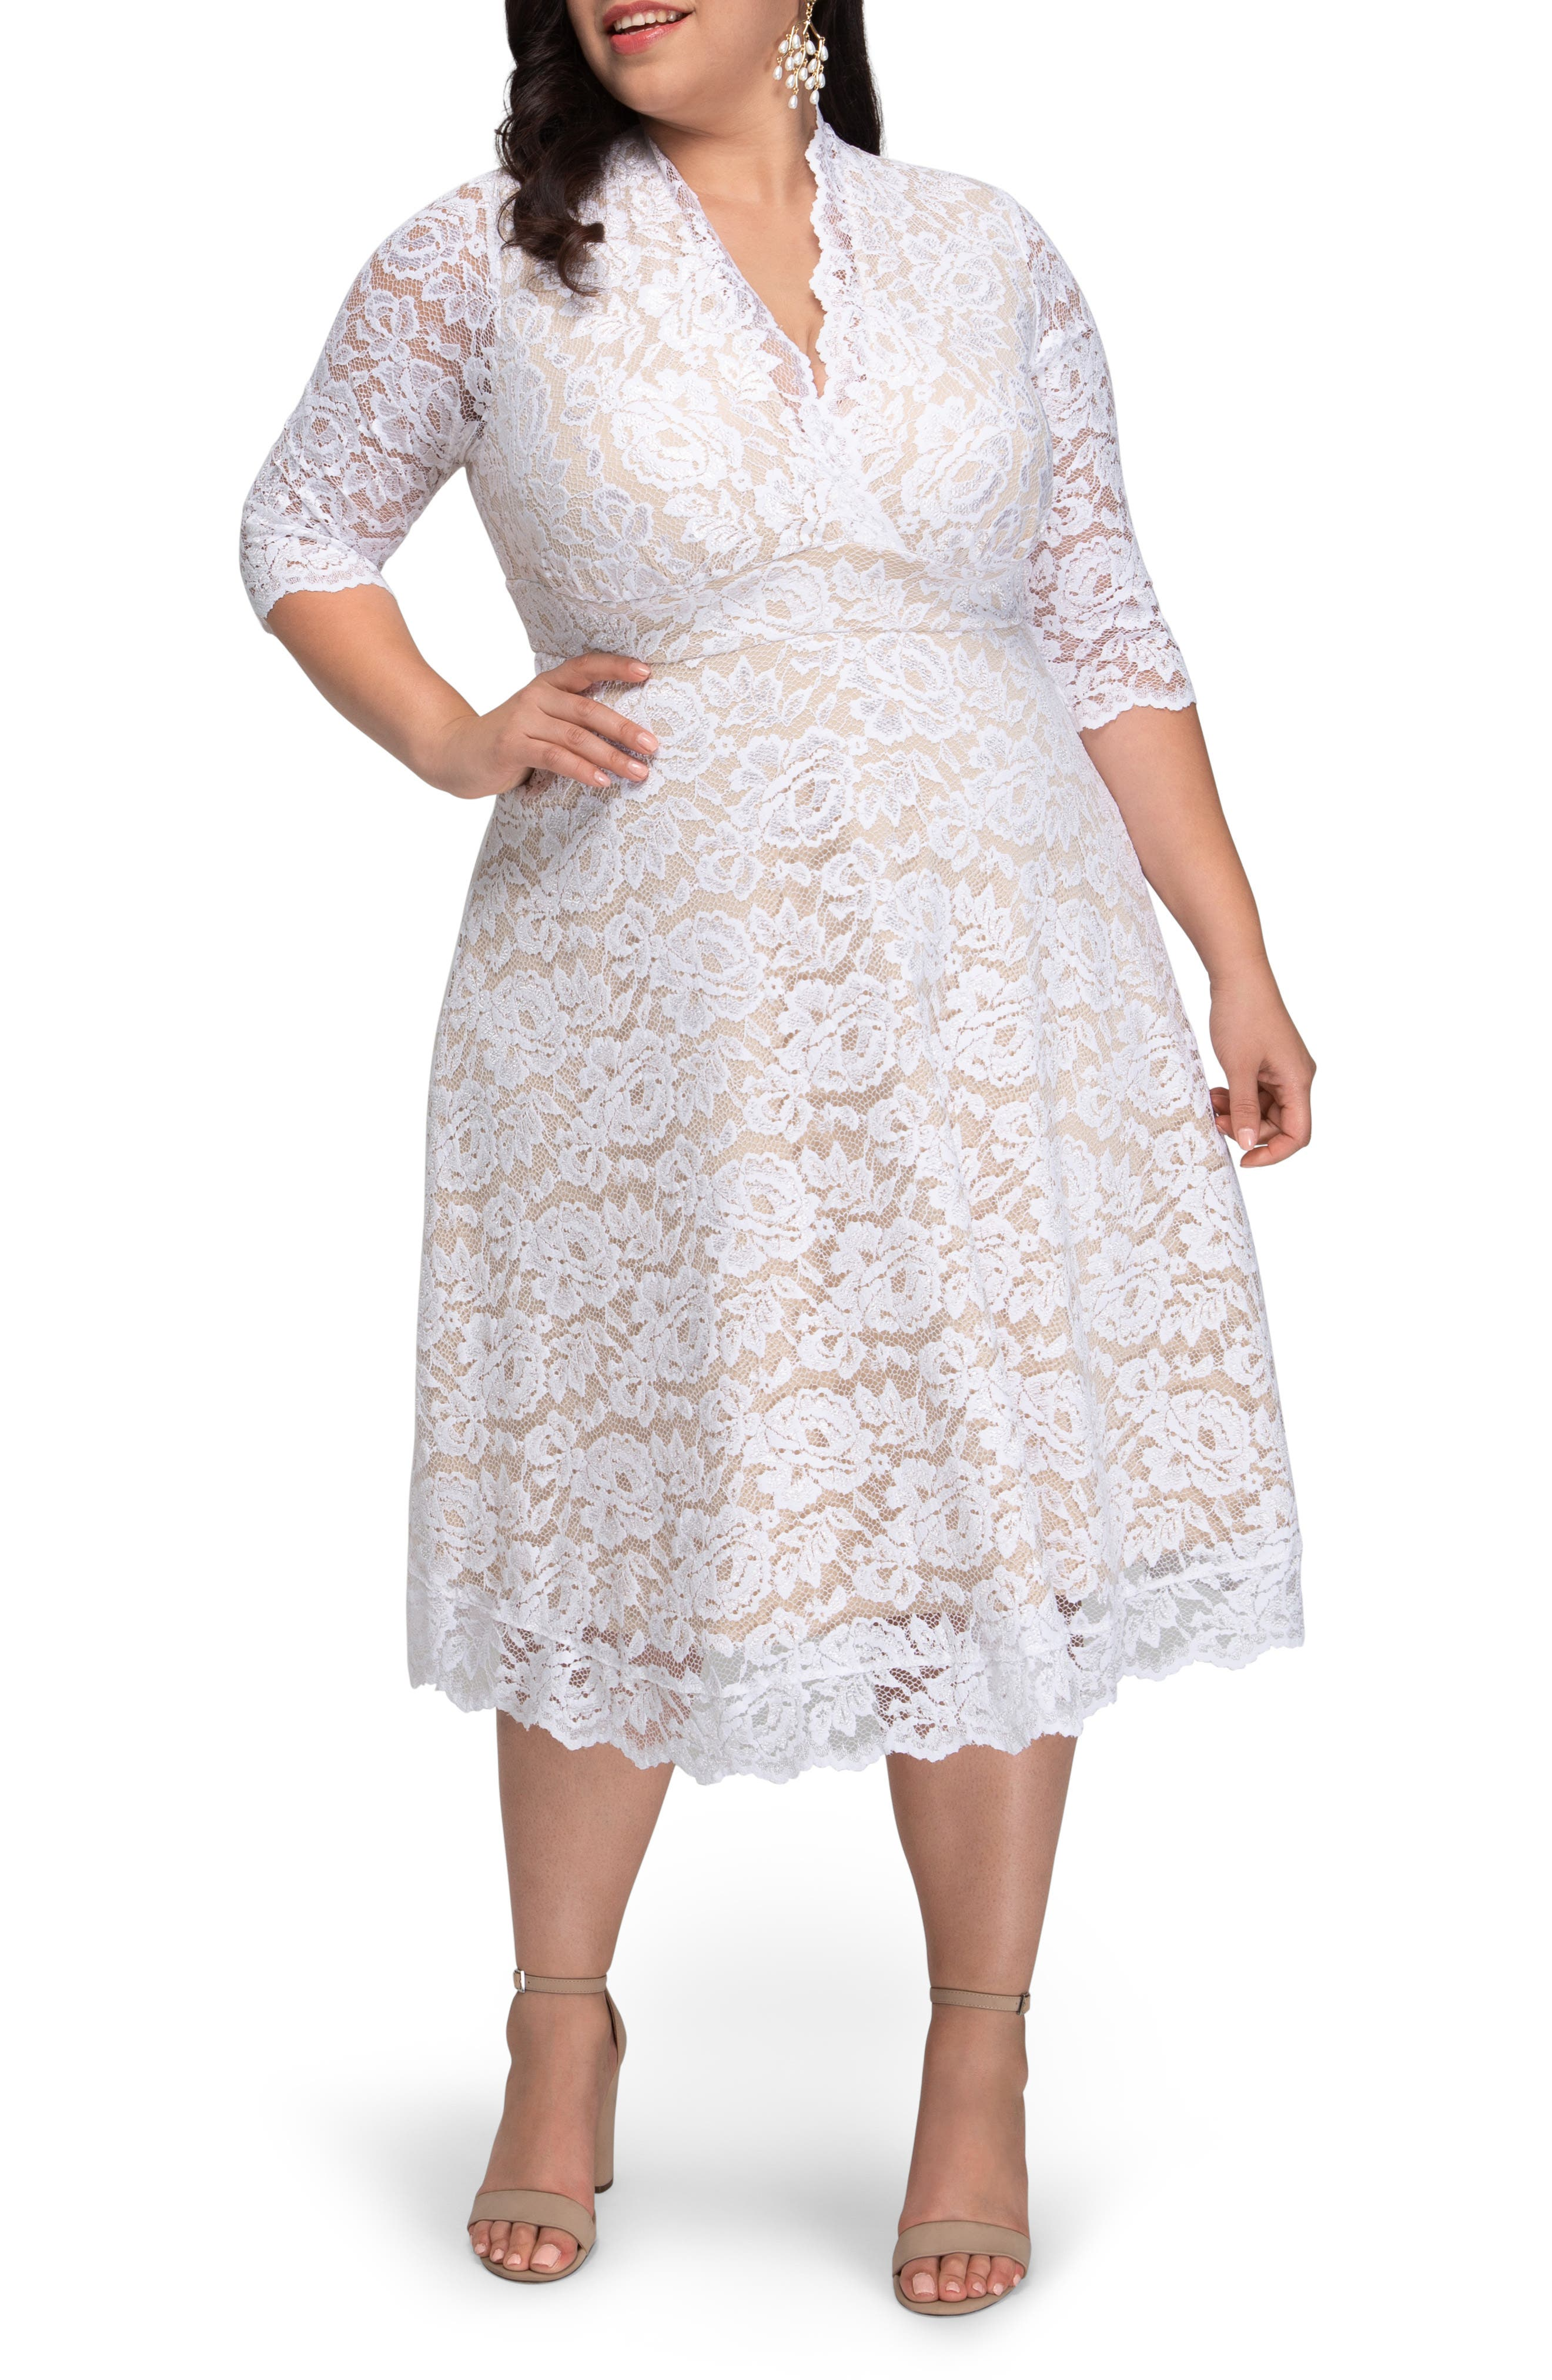 50s Wedding Dress, 1950s Style Wedding Dresses, Rockabilly Weddings Plus Size Womens Kiyonna Bella Lace Fit  Flare Dress Size 3X - White $198.00 AT vintagedancer.com